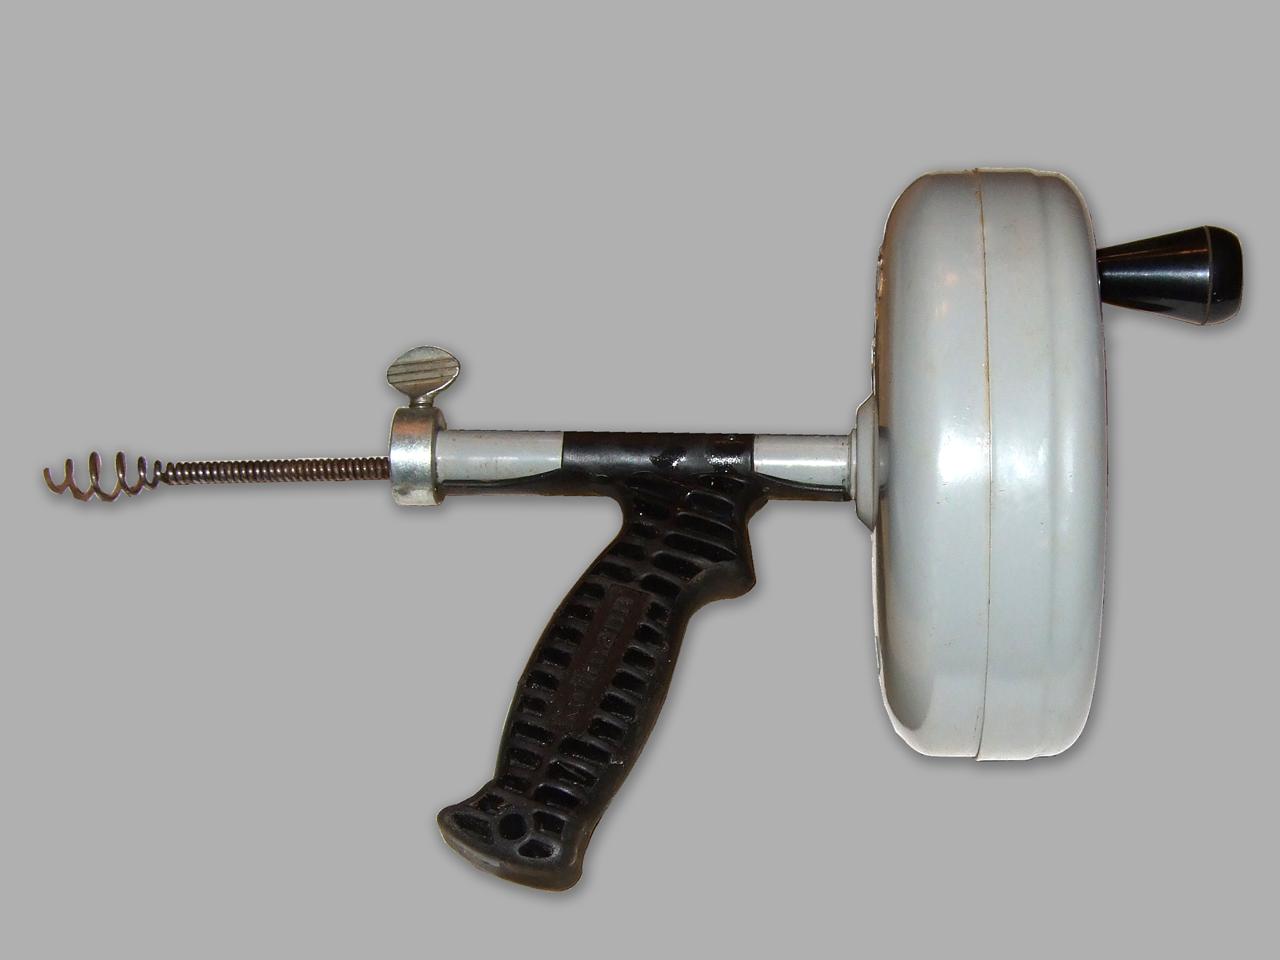 Image of plumbers handheld drain auger